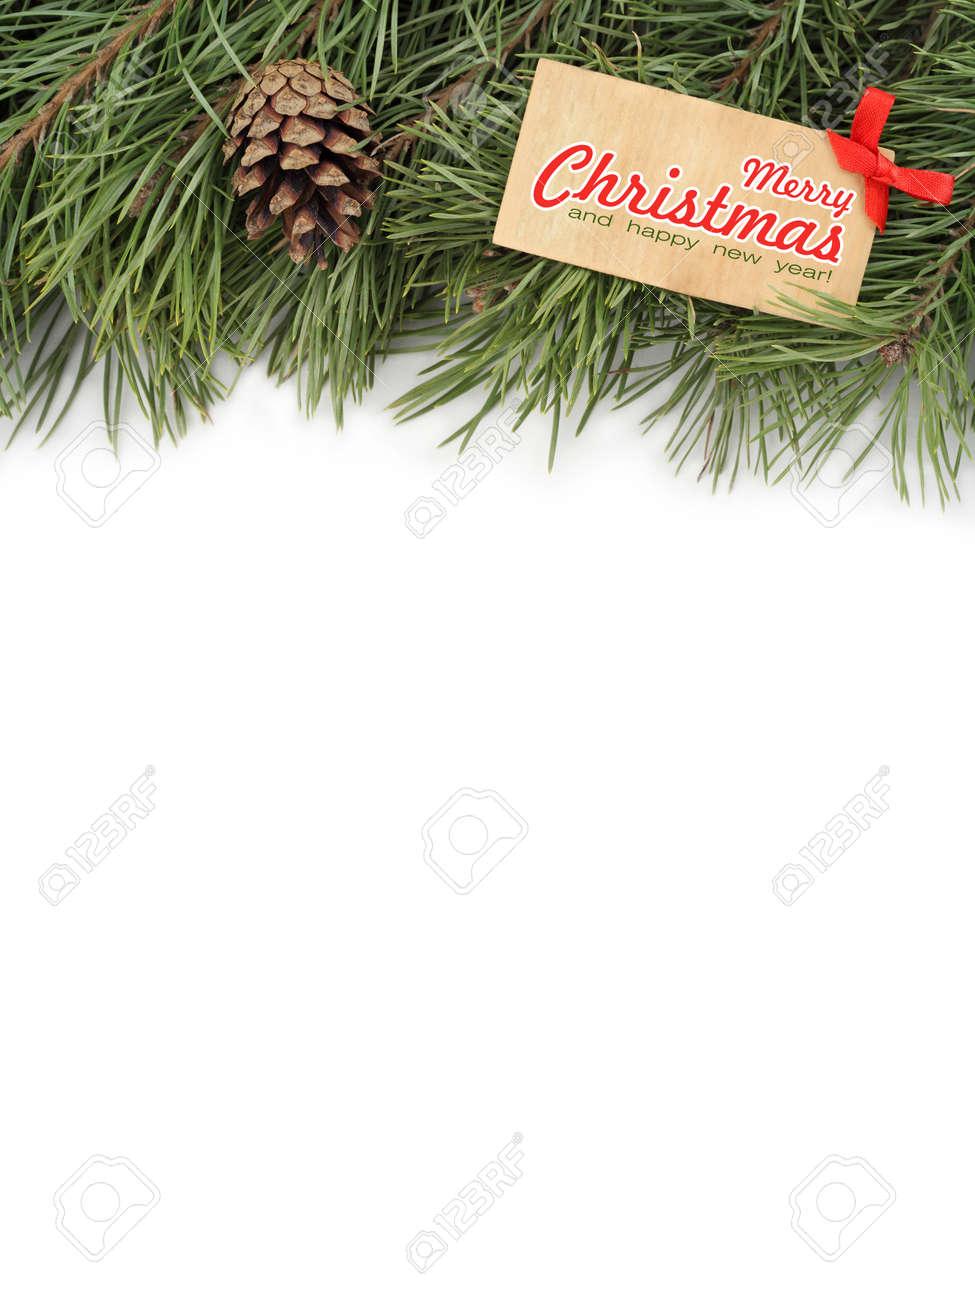 bump メリー クリスマス